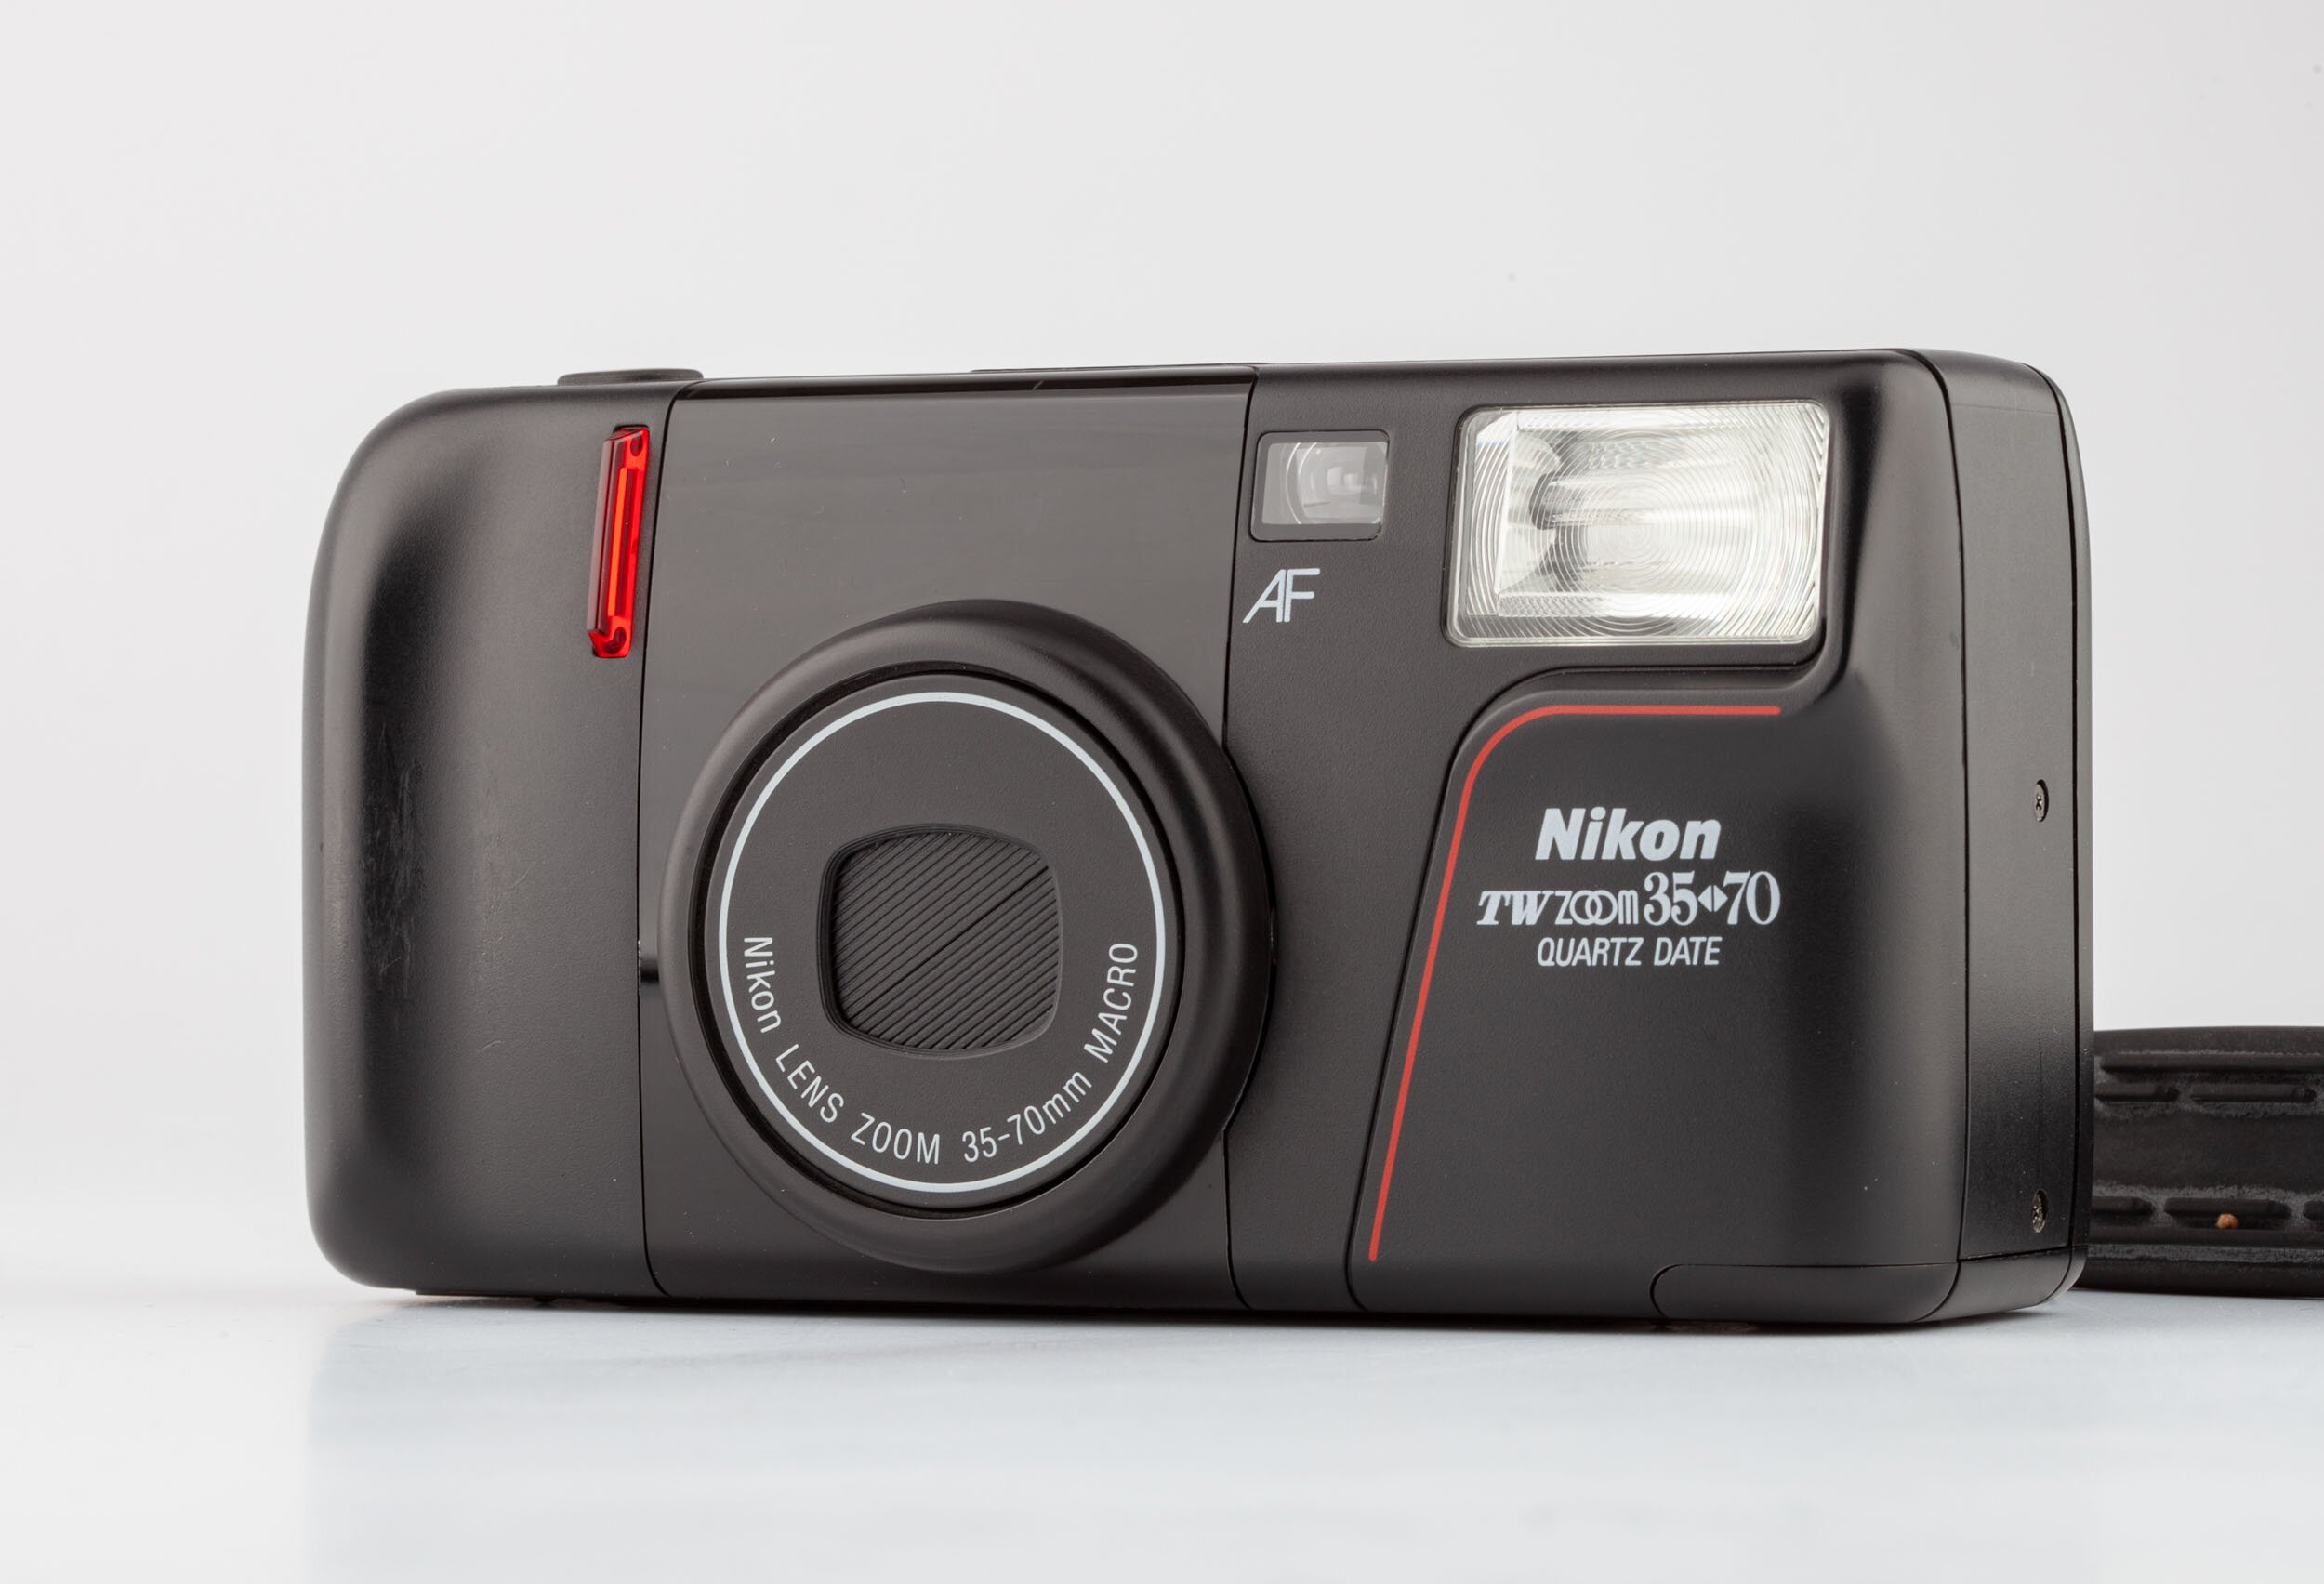 Nikon TW zoom 35-70mm Makro Quartz Date